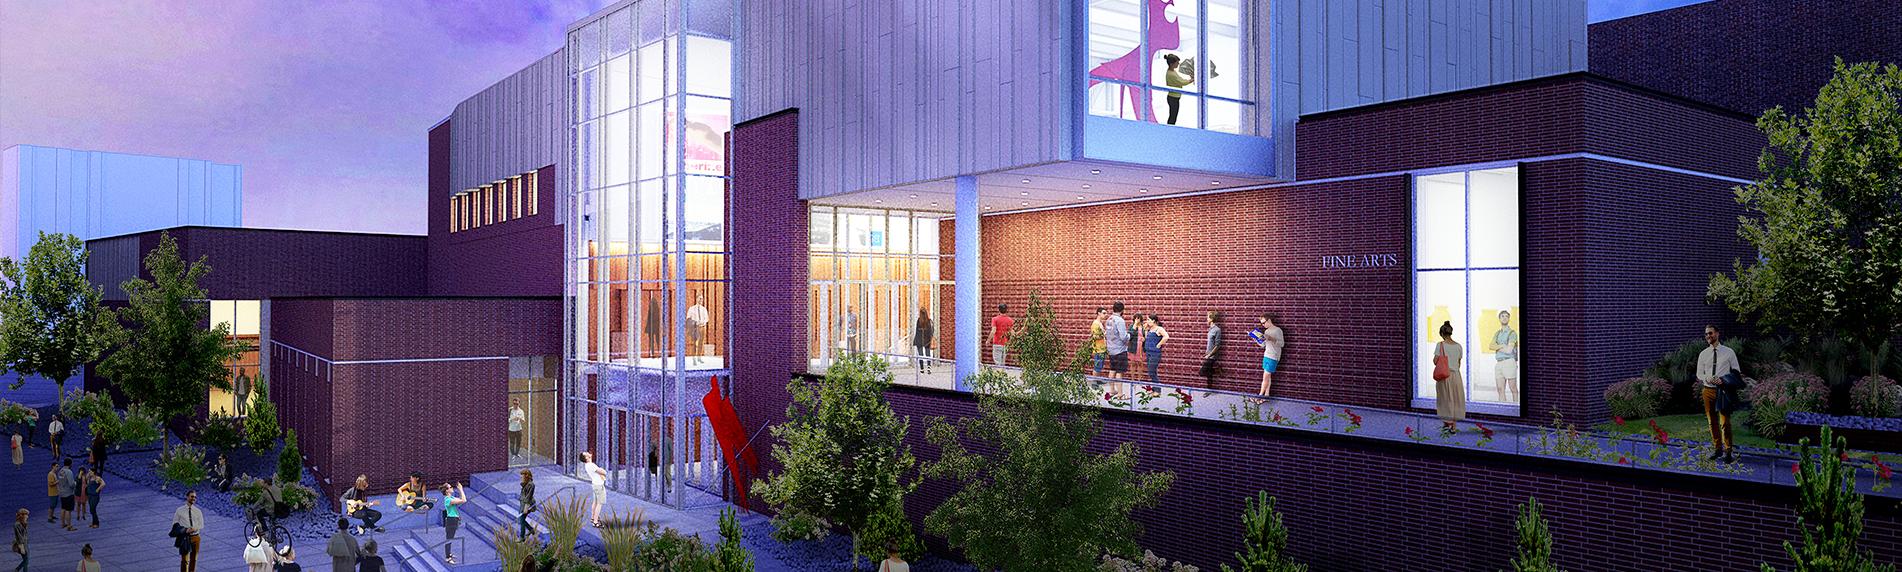 university arts building at UNR